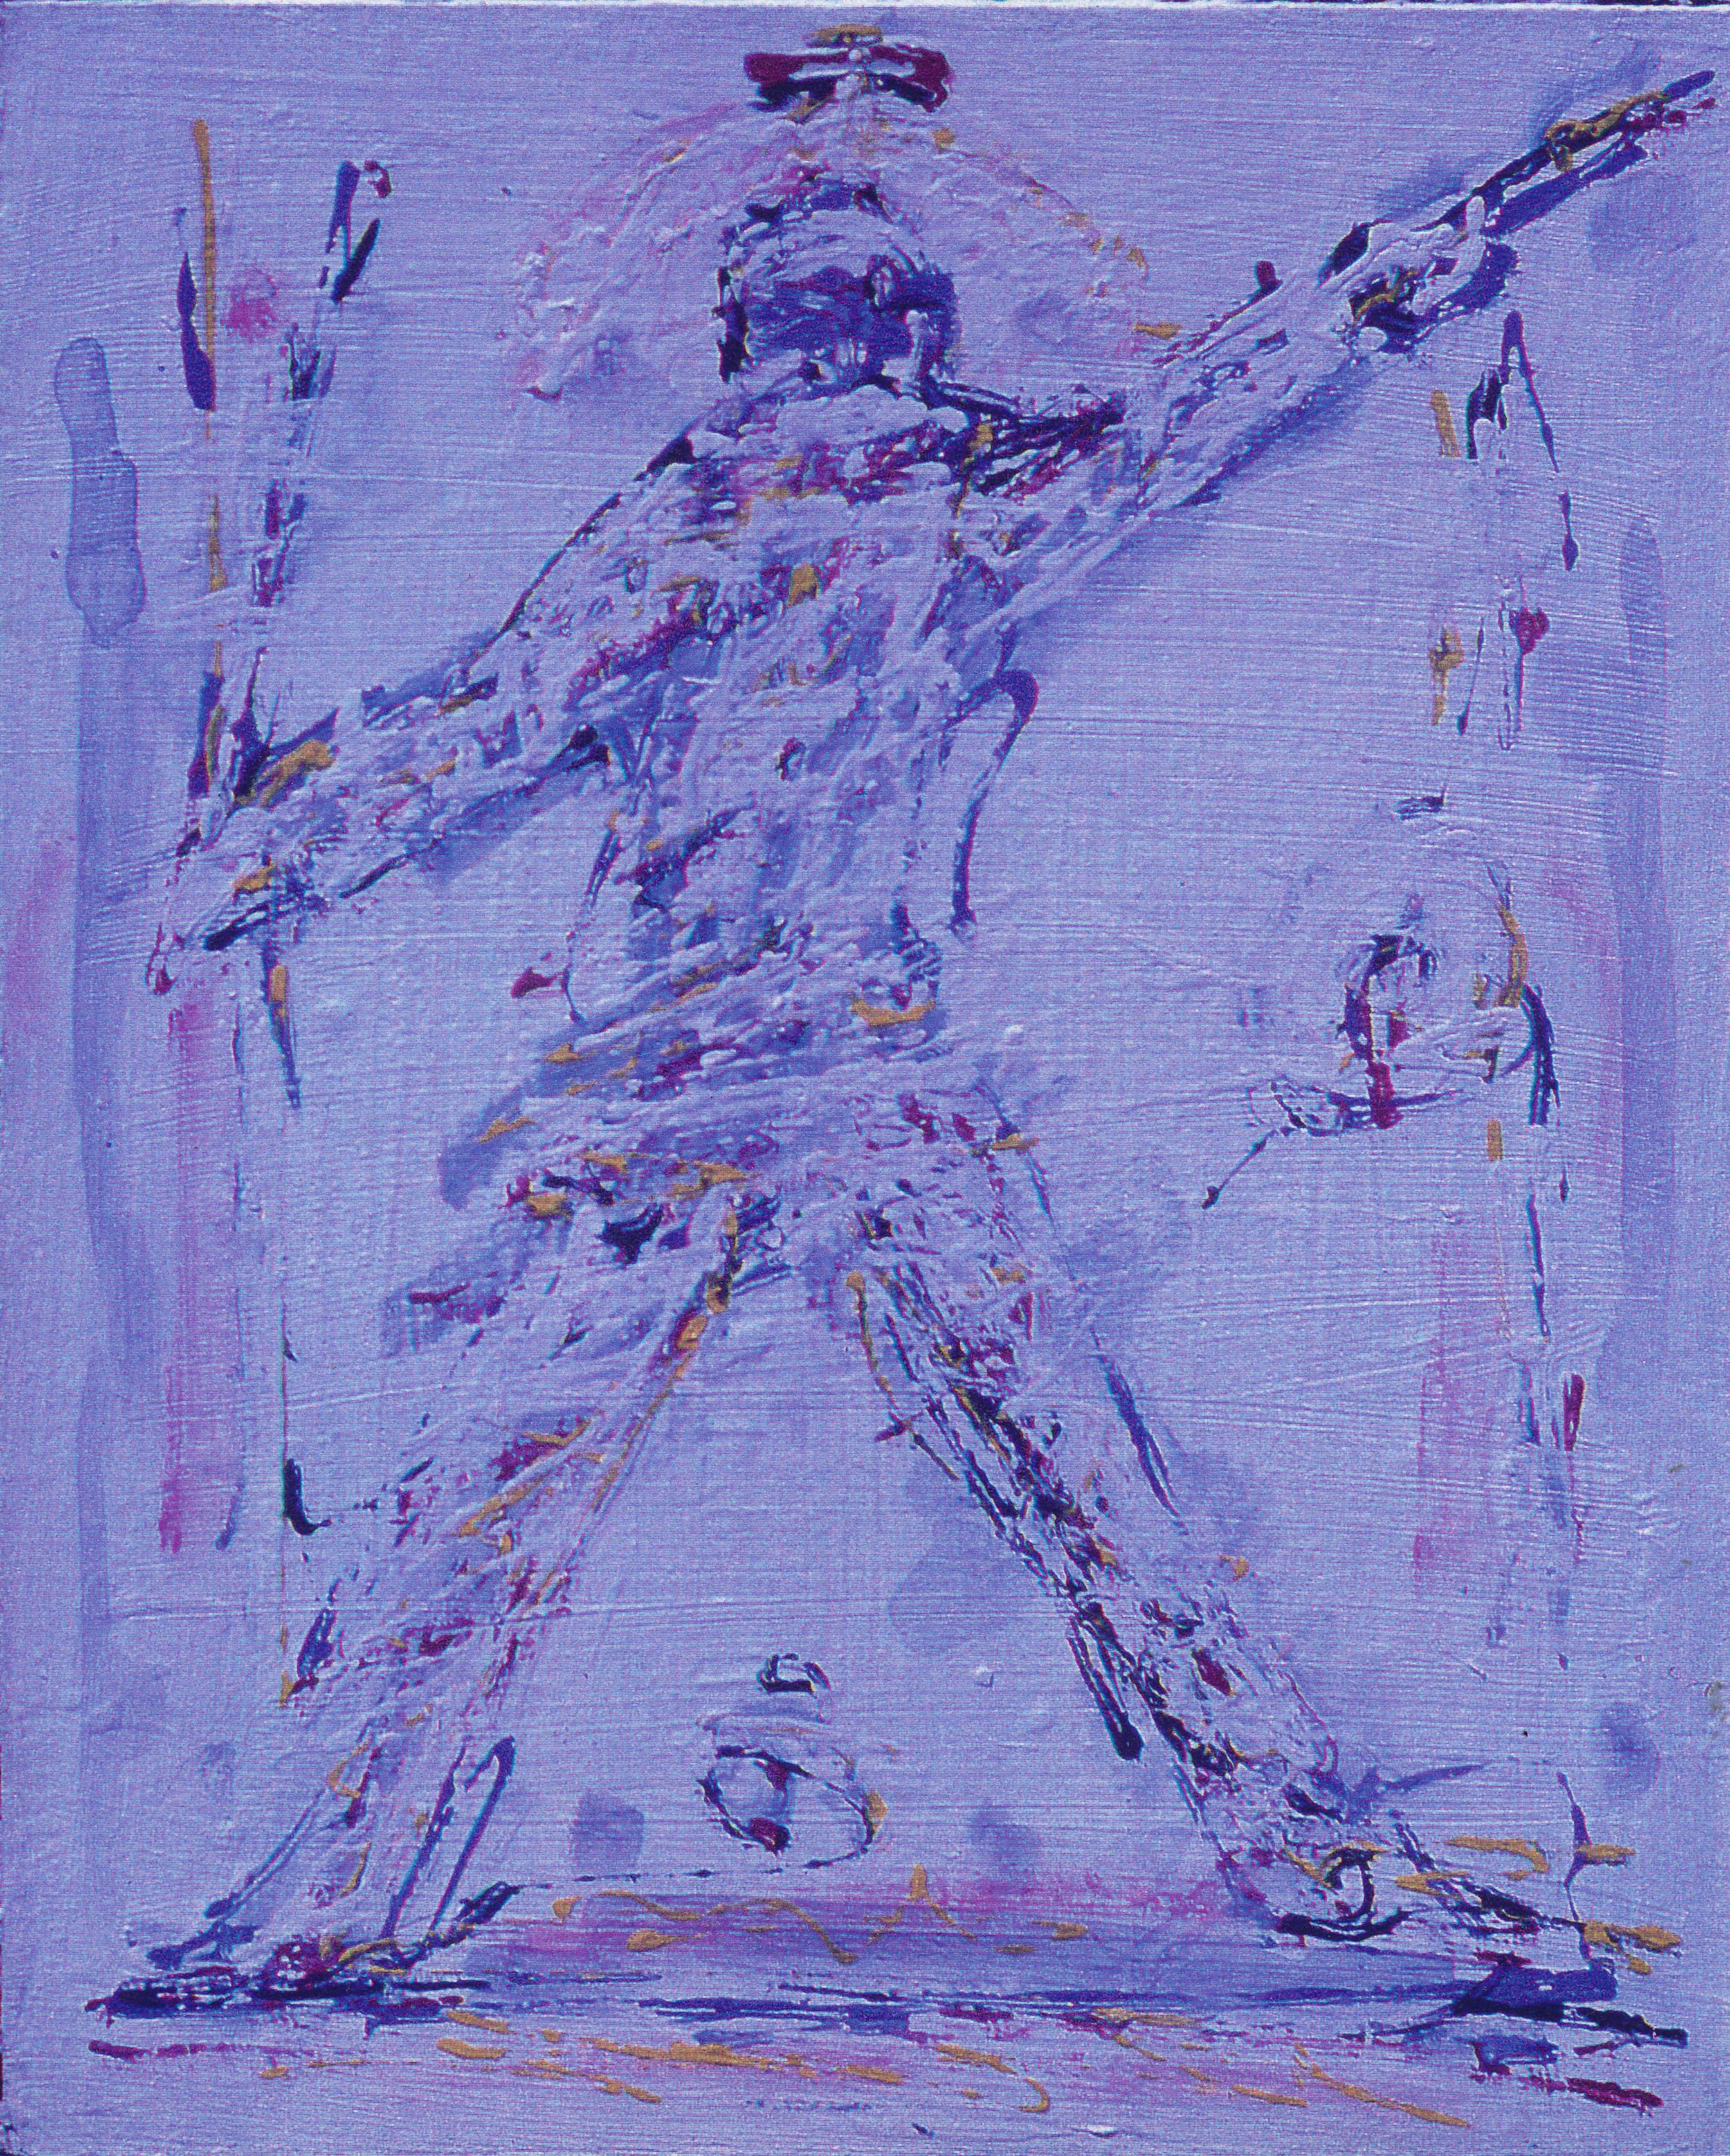 Untitled 9 1994